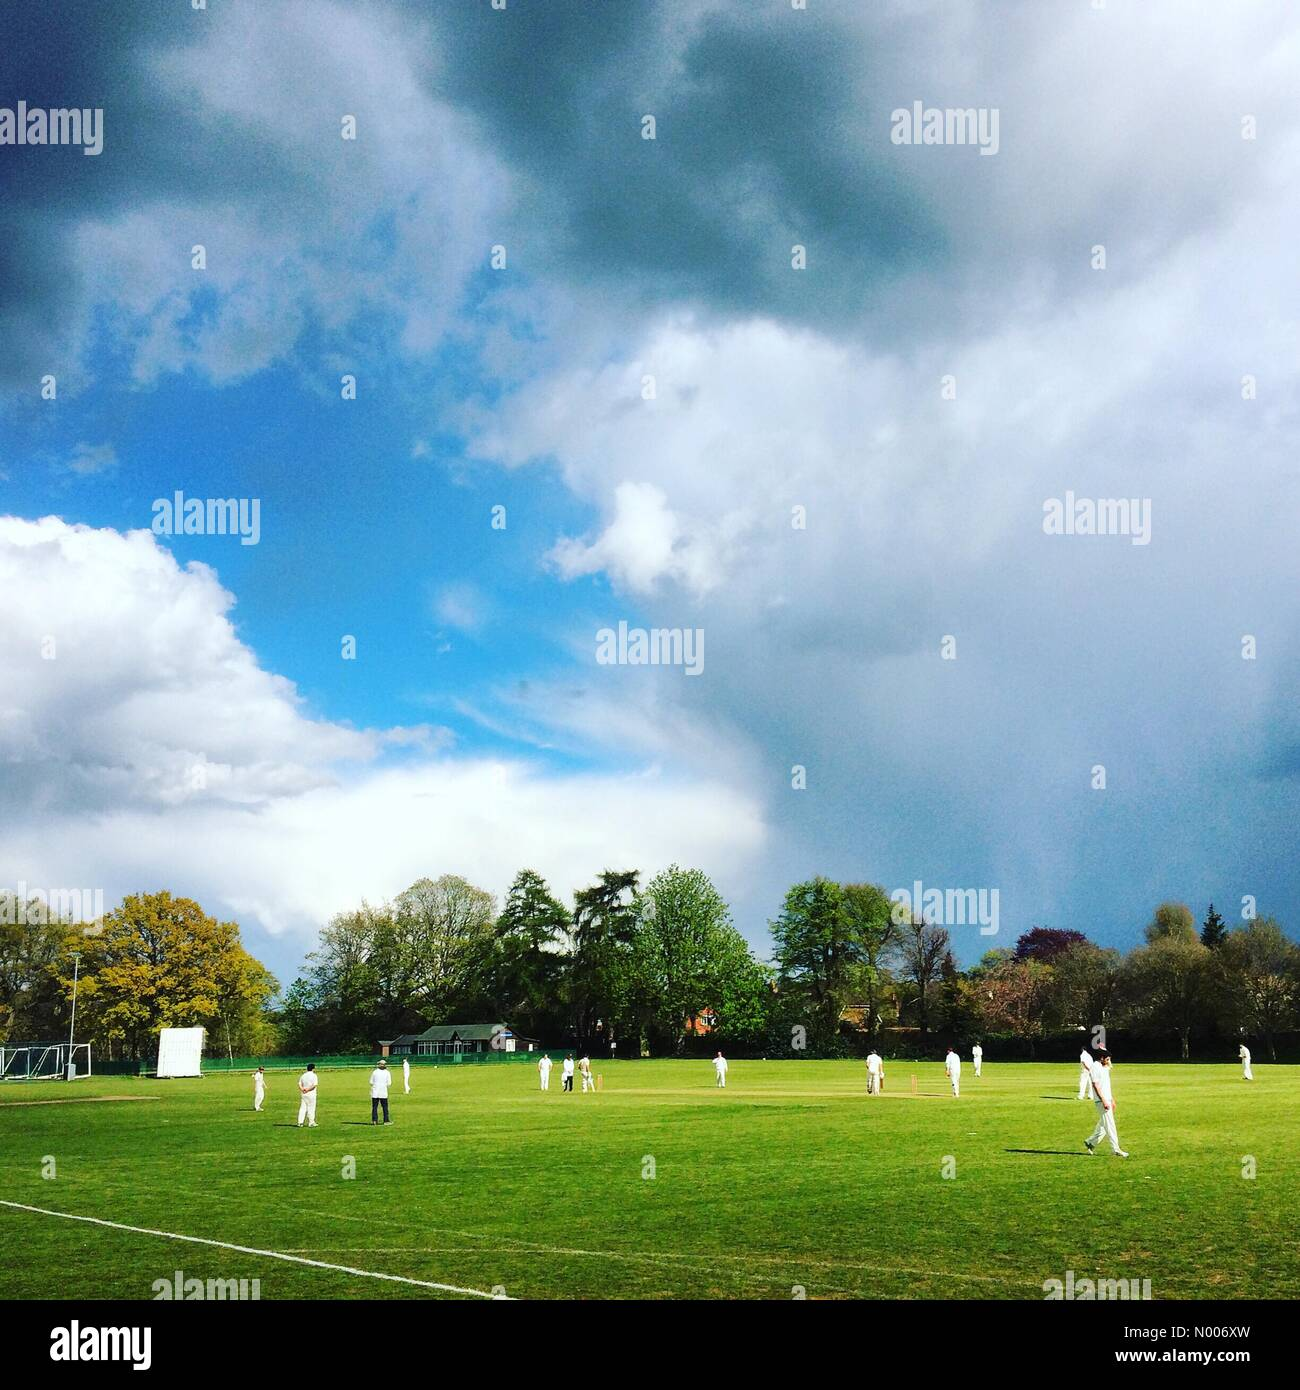 Busbridge Ln, Godalming, Surrey, UK. 30th Apr, 2016. UK Weather 30th April 2016: A cumulonimbus cloud looming over - Stock Image